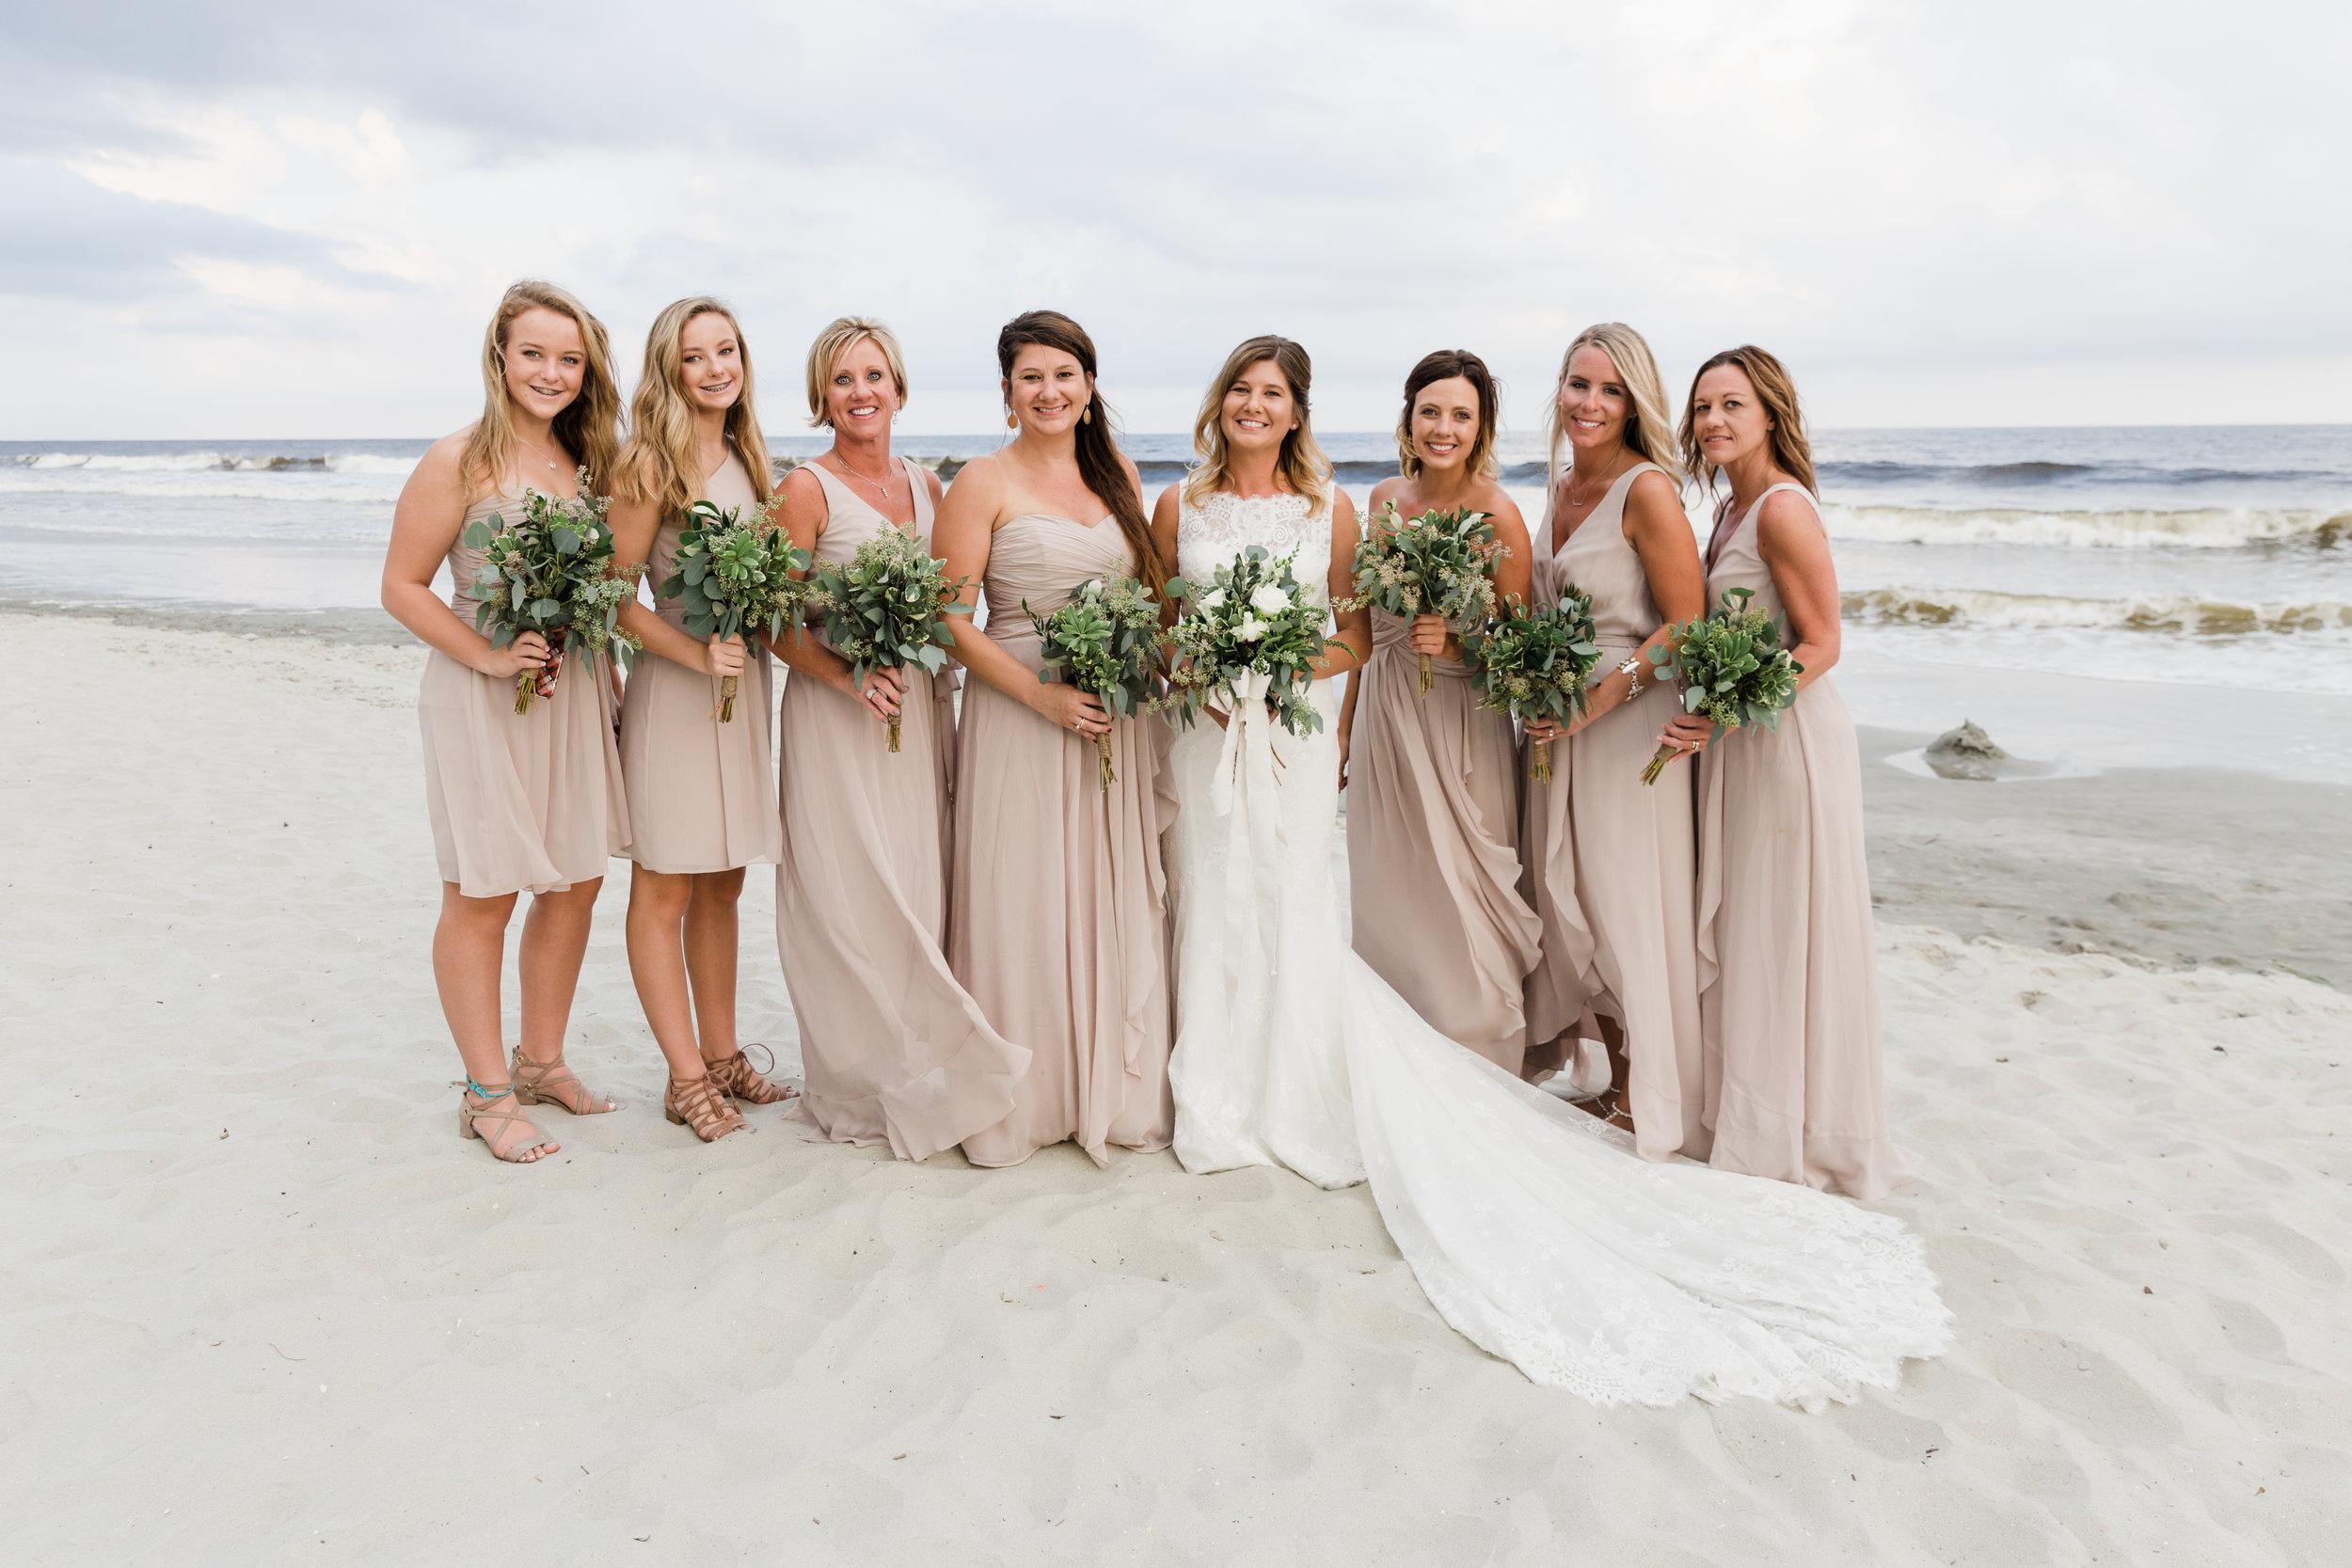 Intimate Wedding Photography Raleigh, Durham, North Carolina